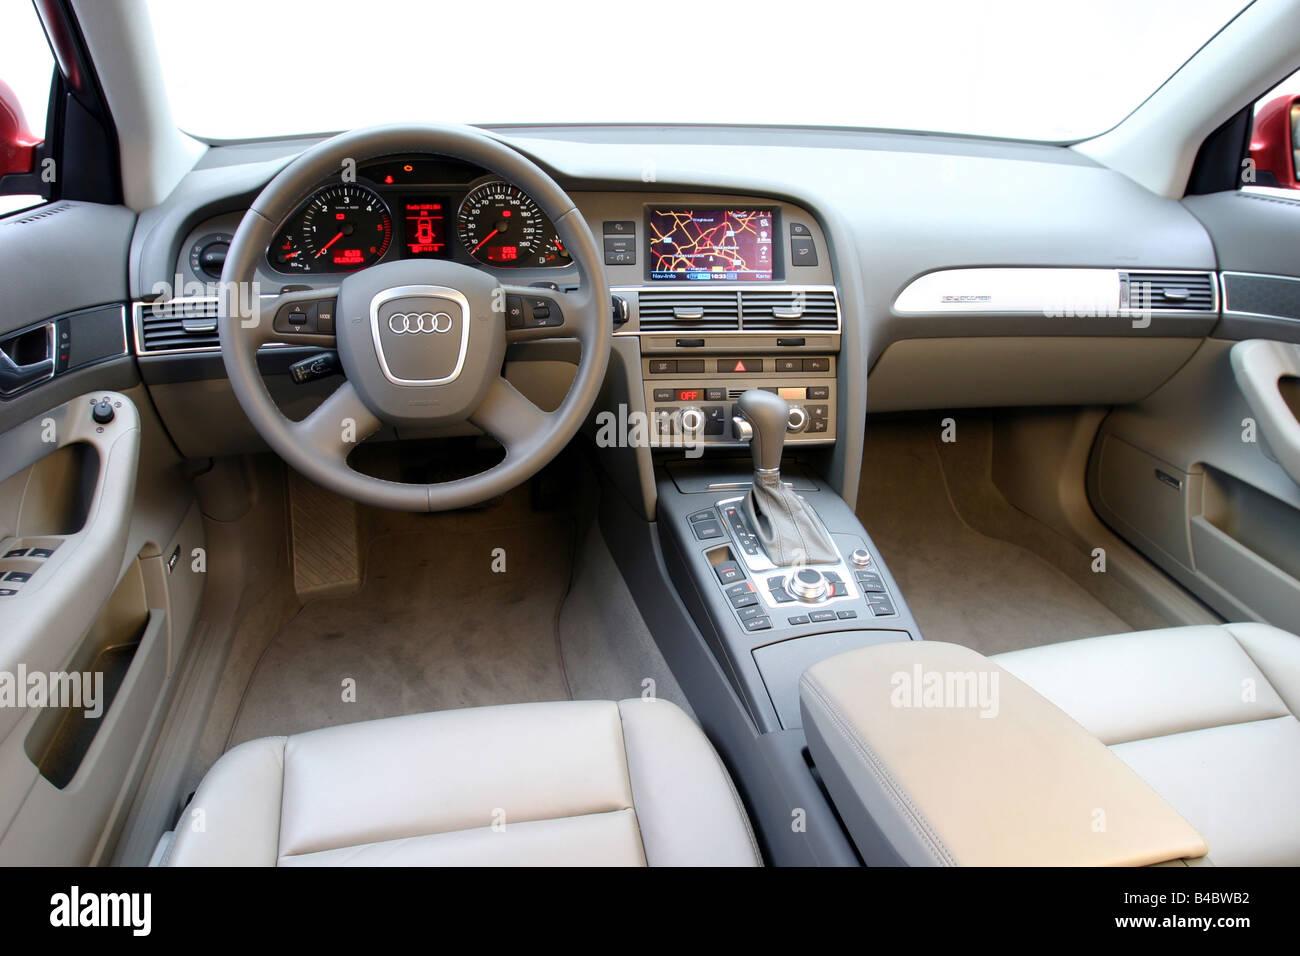 Car Audi A6 3 0 Tdi Quattro Limousine Upper Middle